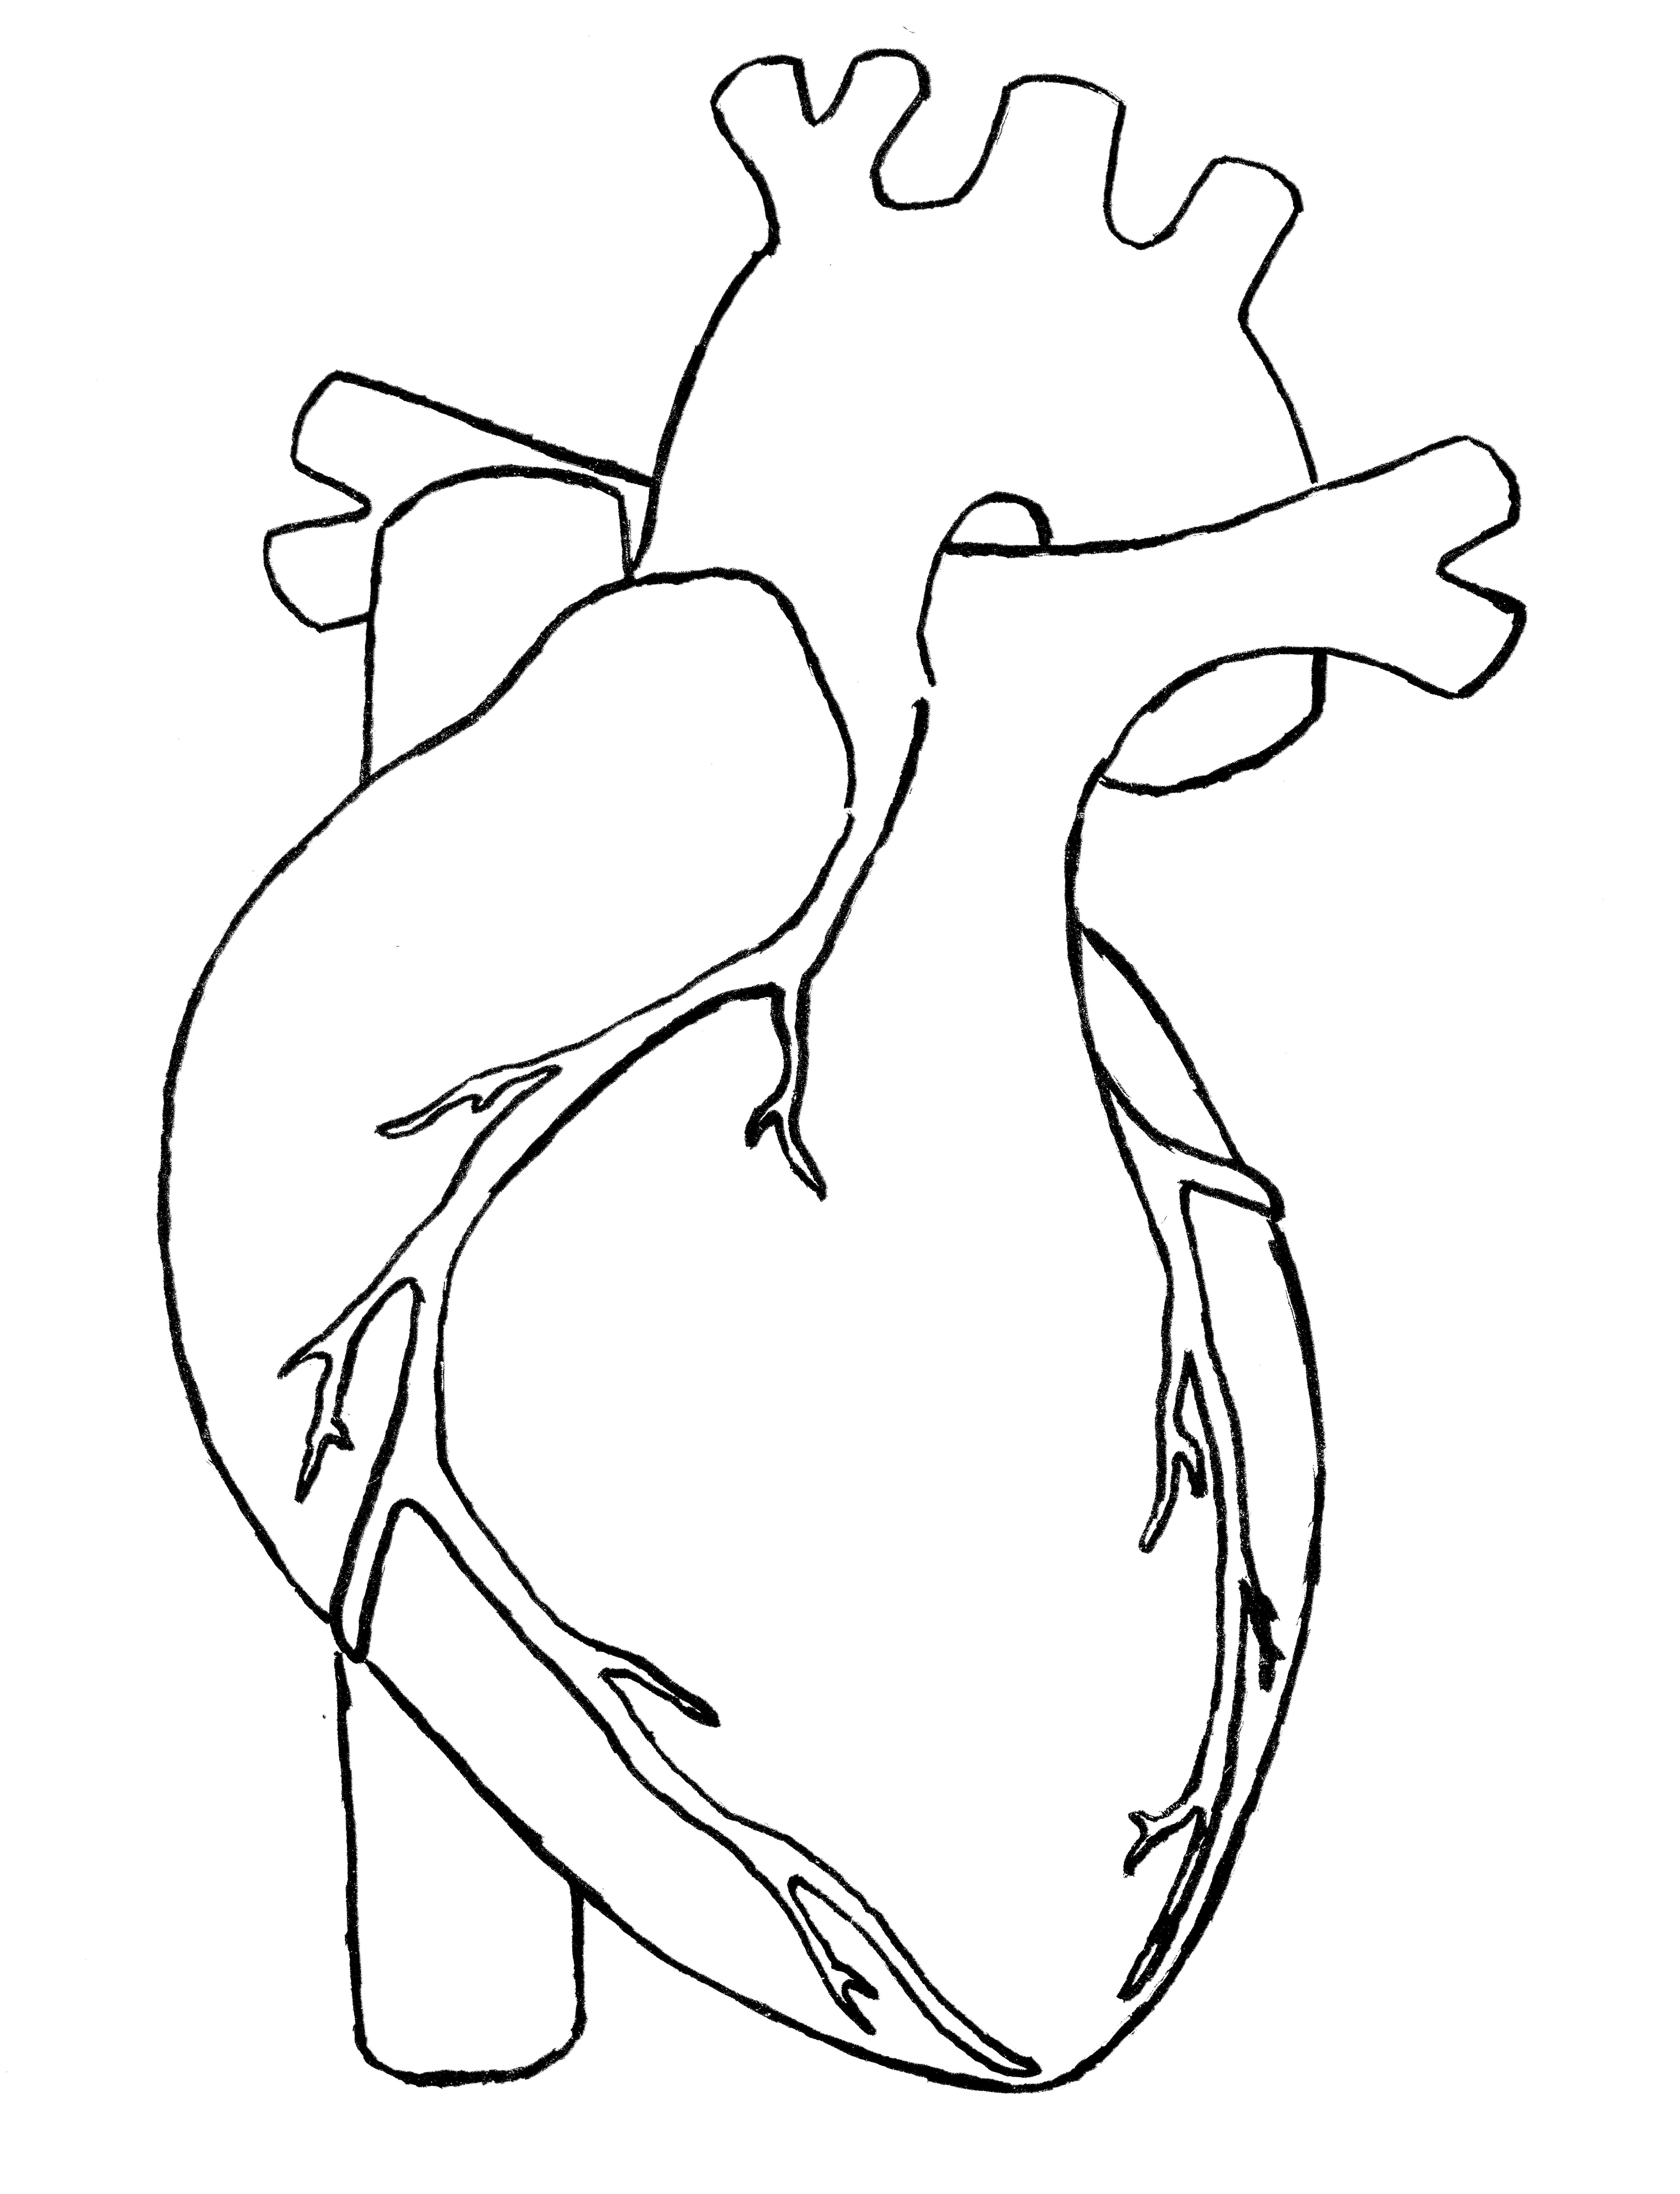 Heart clip art library. Hearts clipart science